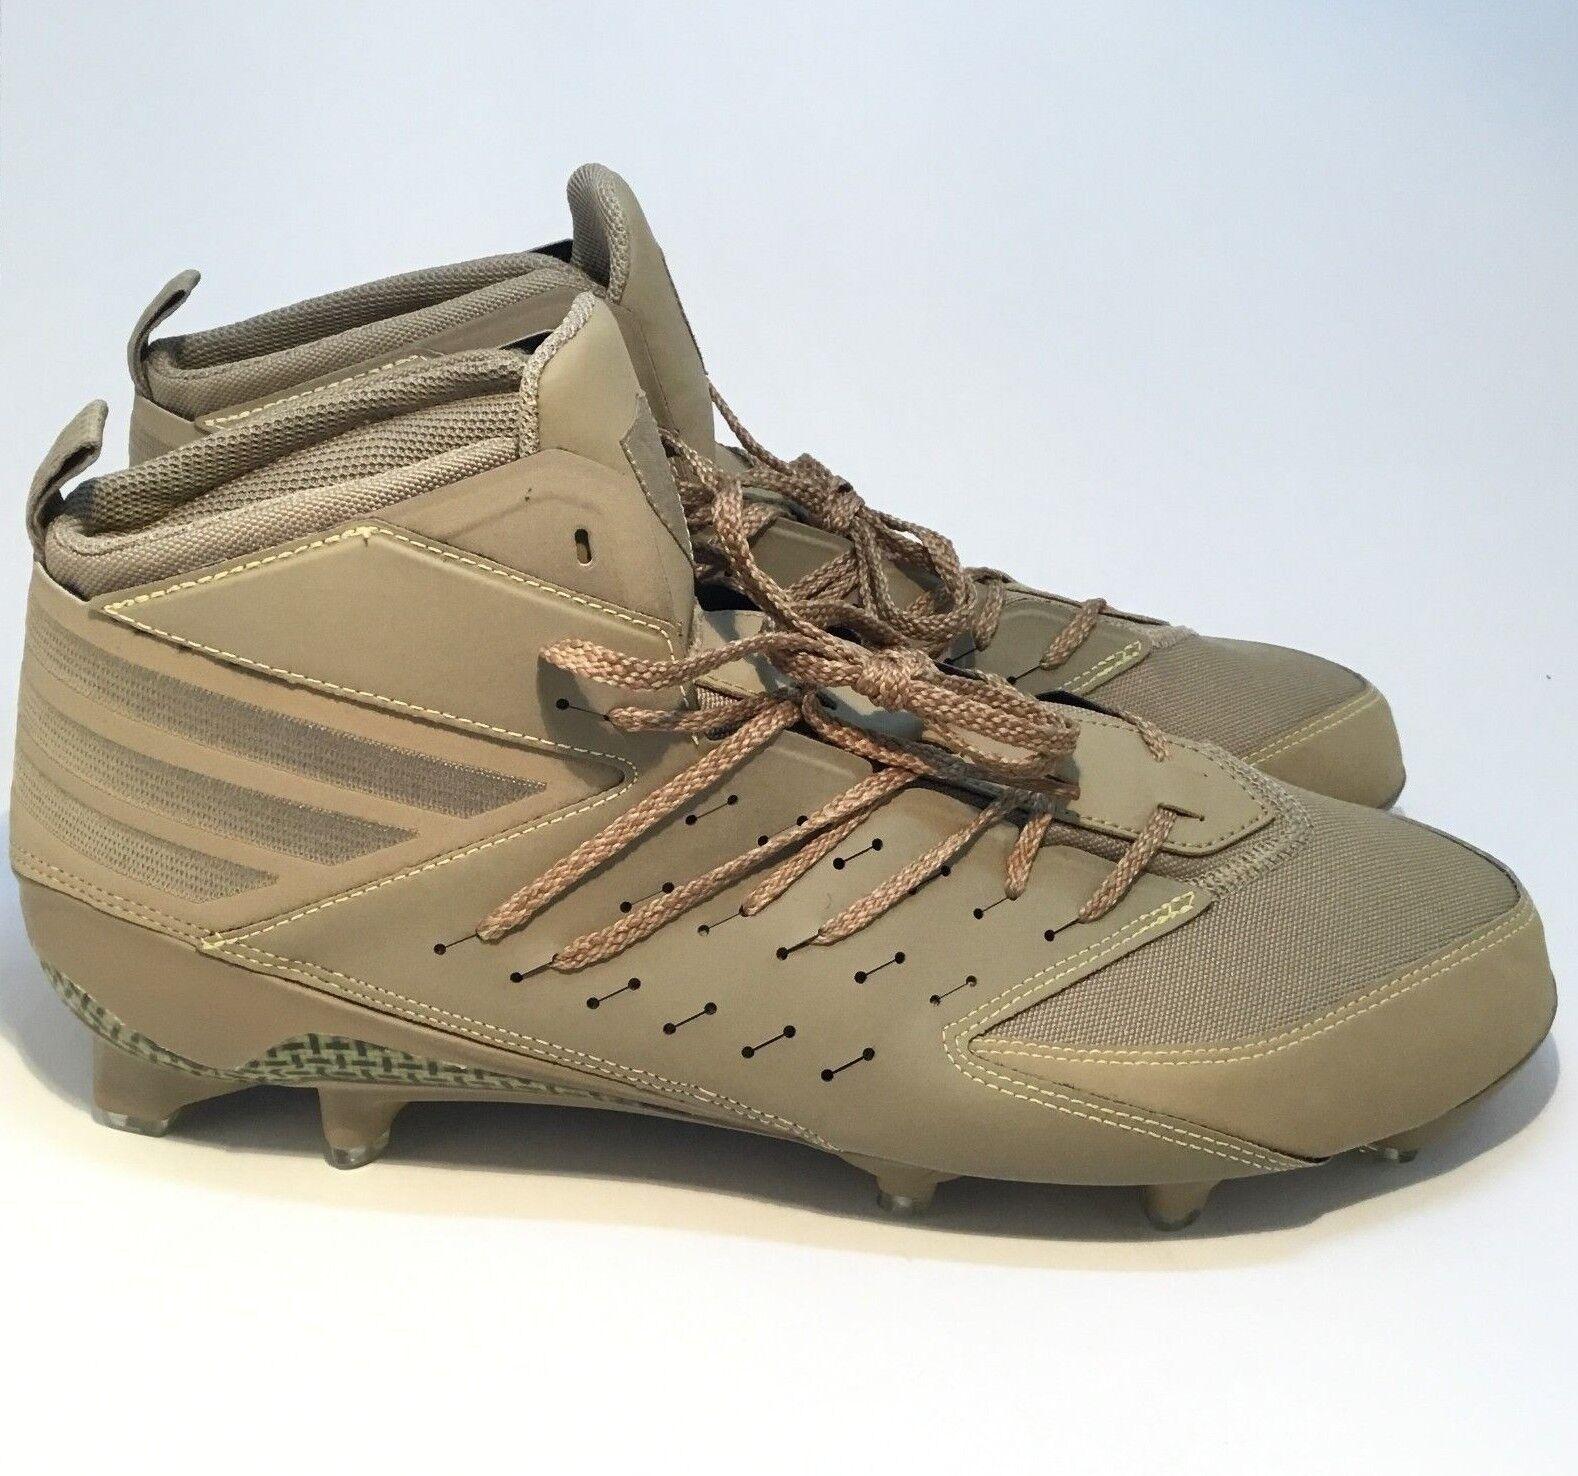 Adidas Dark Ops Freak x Kevlar Cleats Men's Football Hemp Sand Size 14 AQ6836